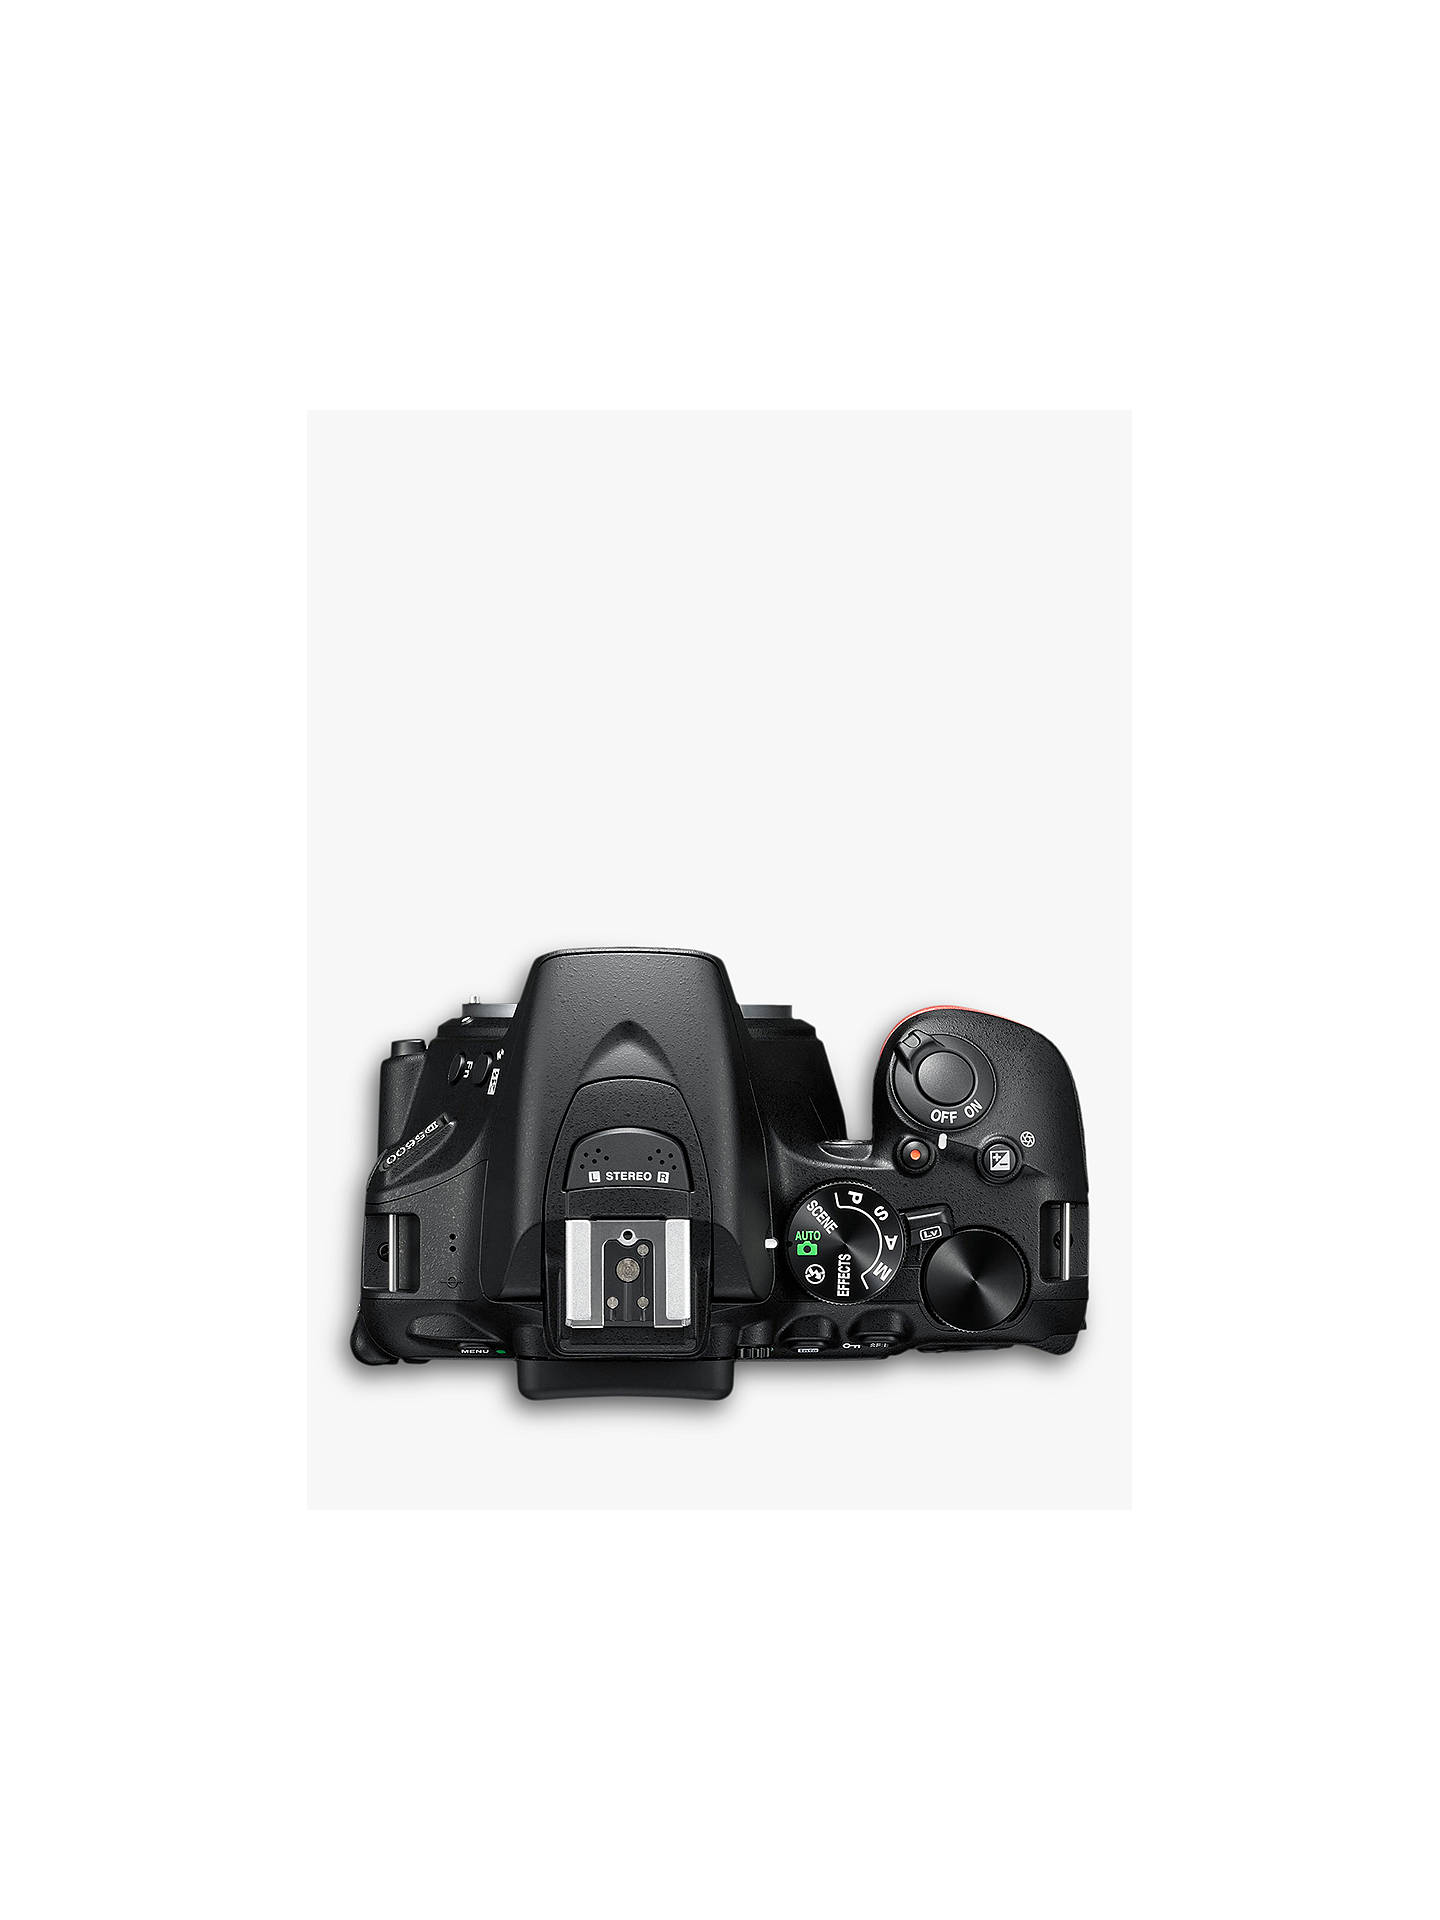 Nikon D5600 Digital SLR Camera with 18-55mm VR Lens, HD 1080p, 24 2MP,  Wi-Fi, Optical Viewfinder, 3 2